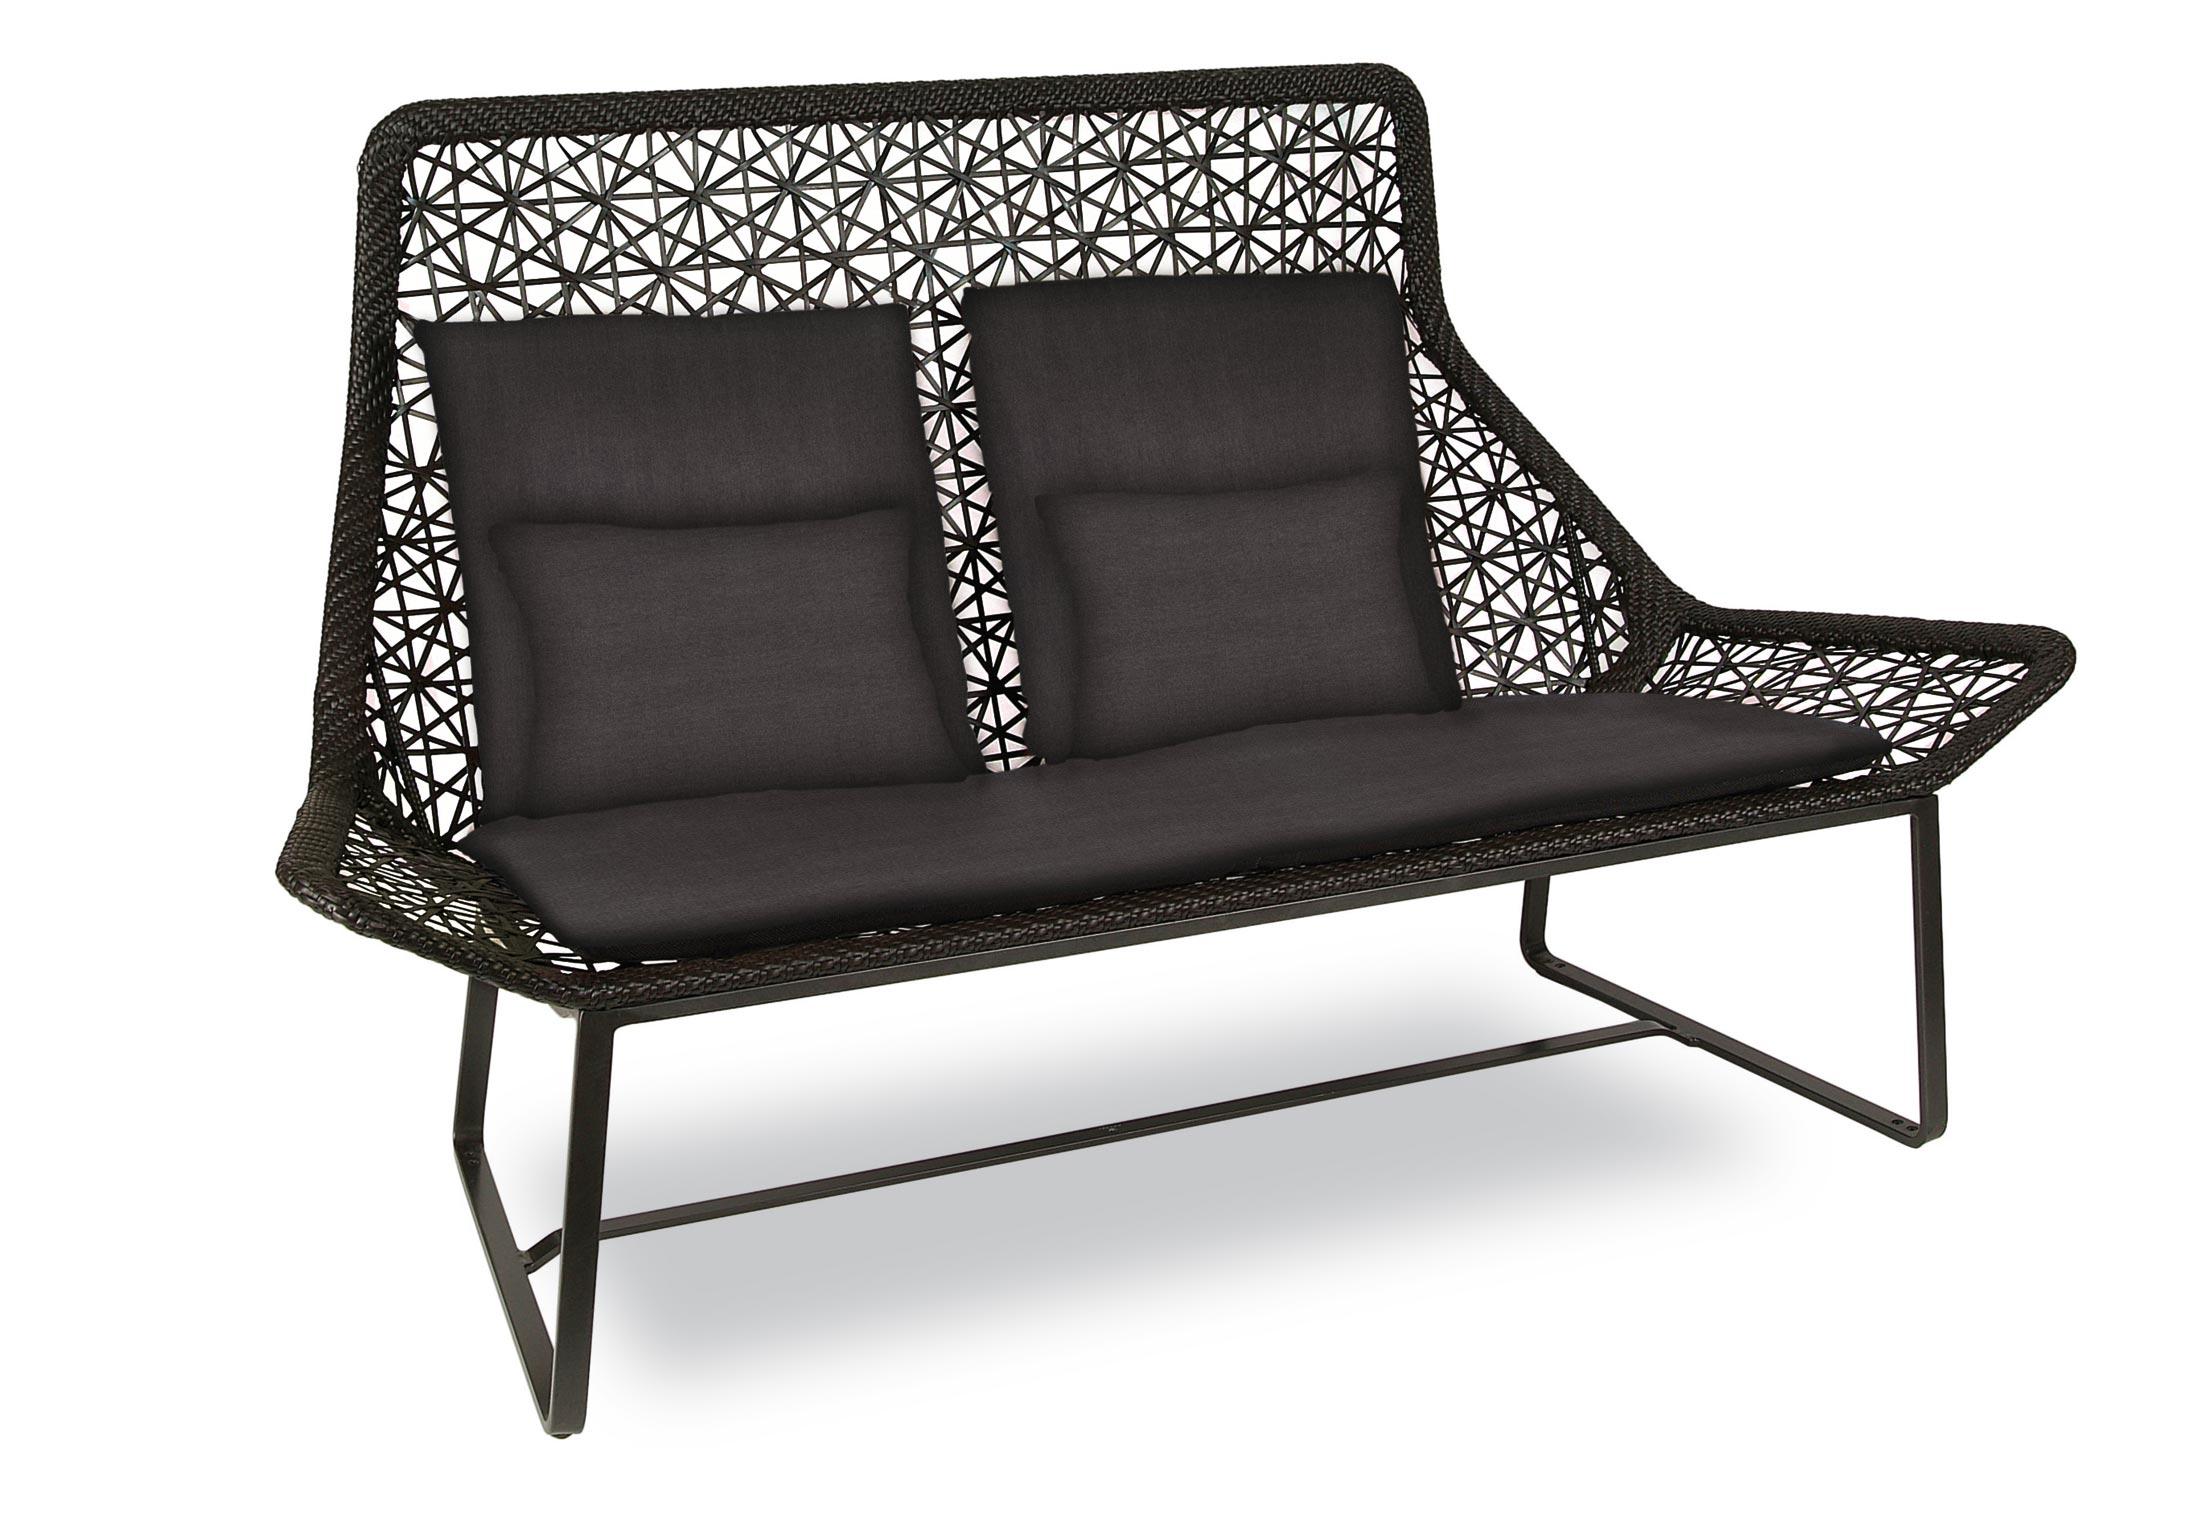 Maia sofa by kettal stylepark for Kettal maia